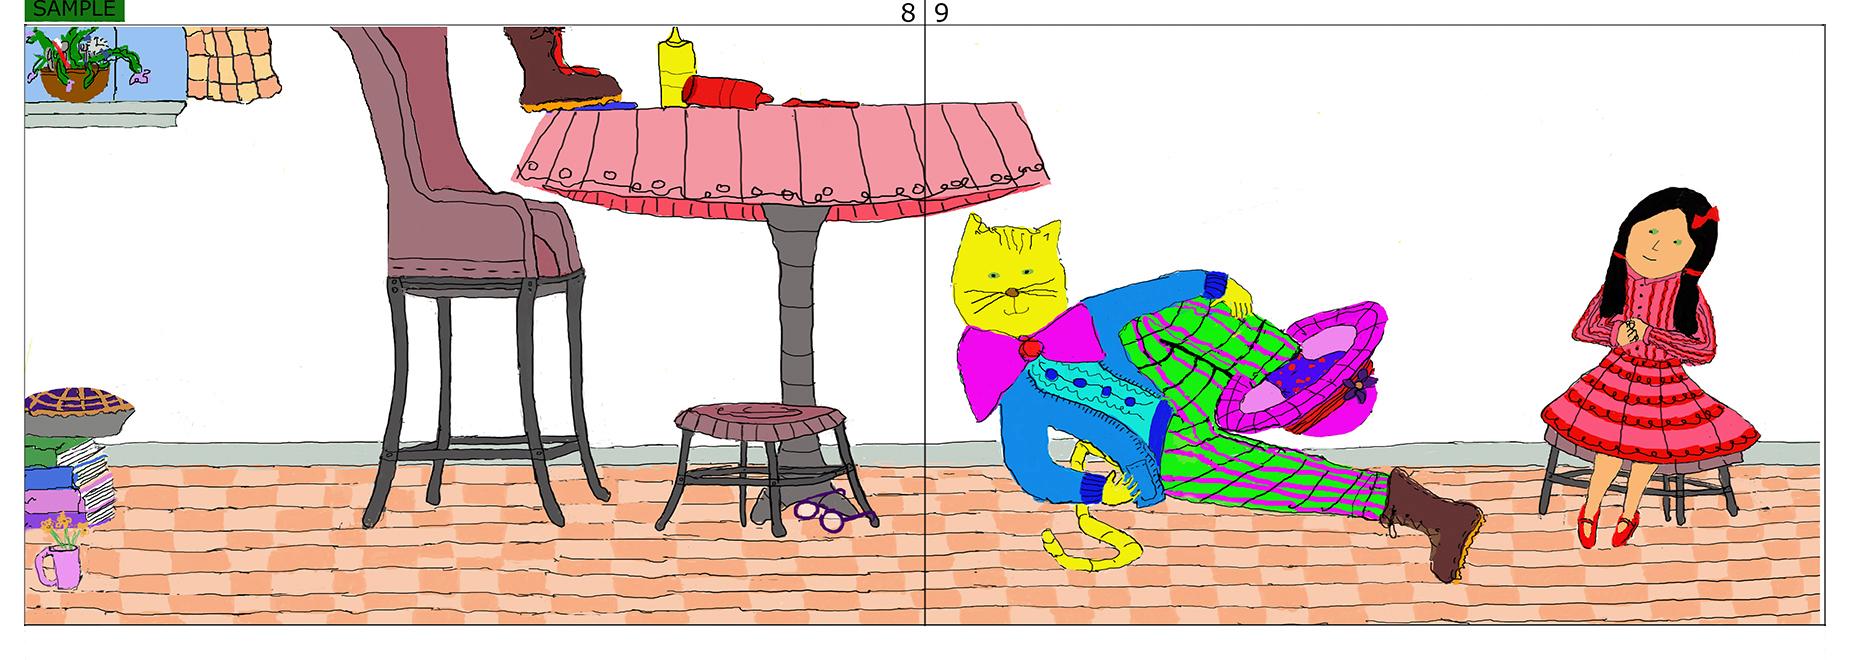 mr kitty sample website copy.jpg